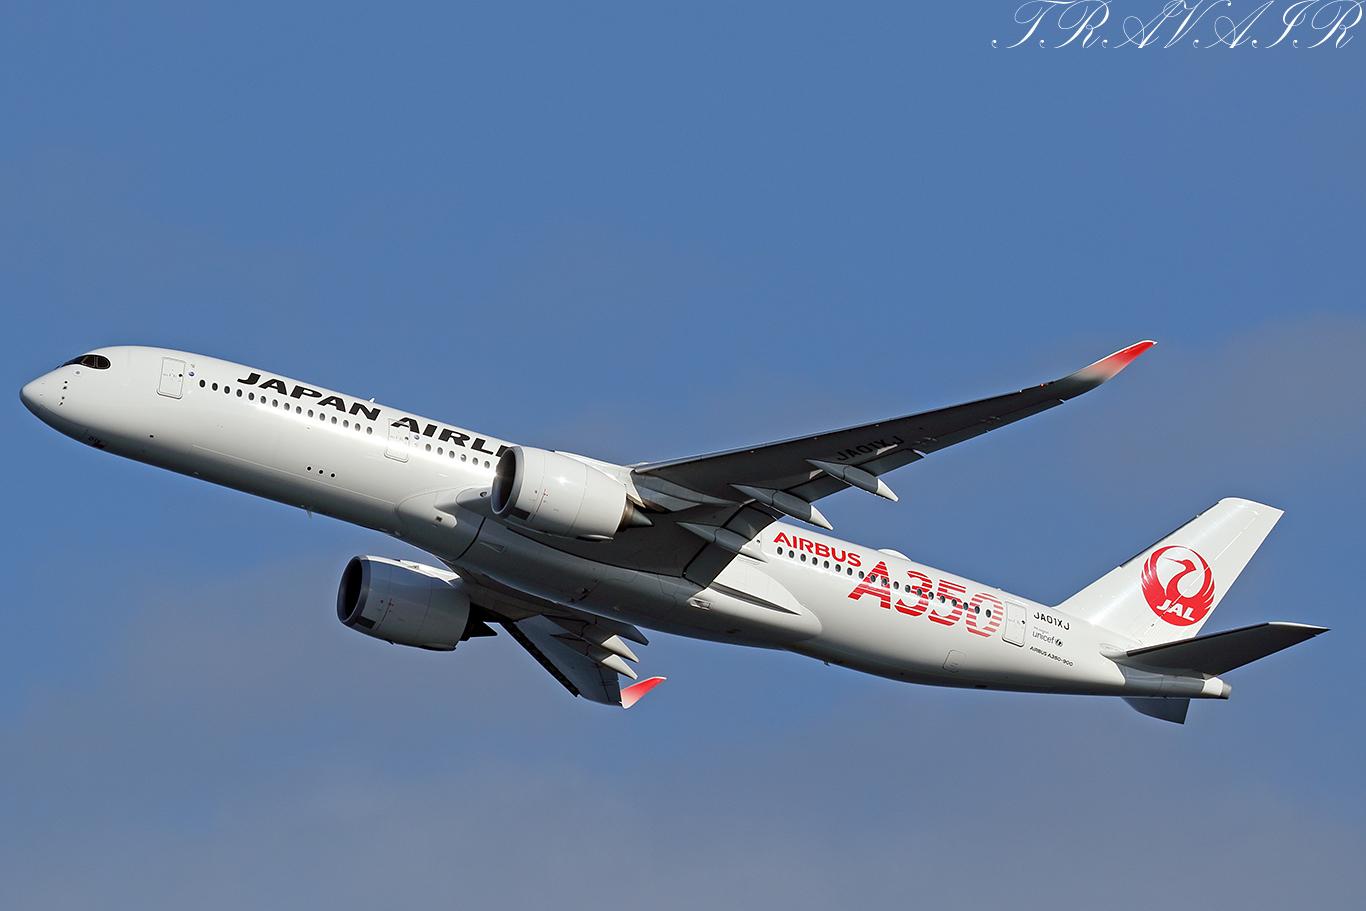 JL/JAL/日本航空 JL517 A350-900 JA01XJ